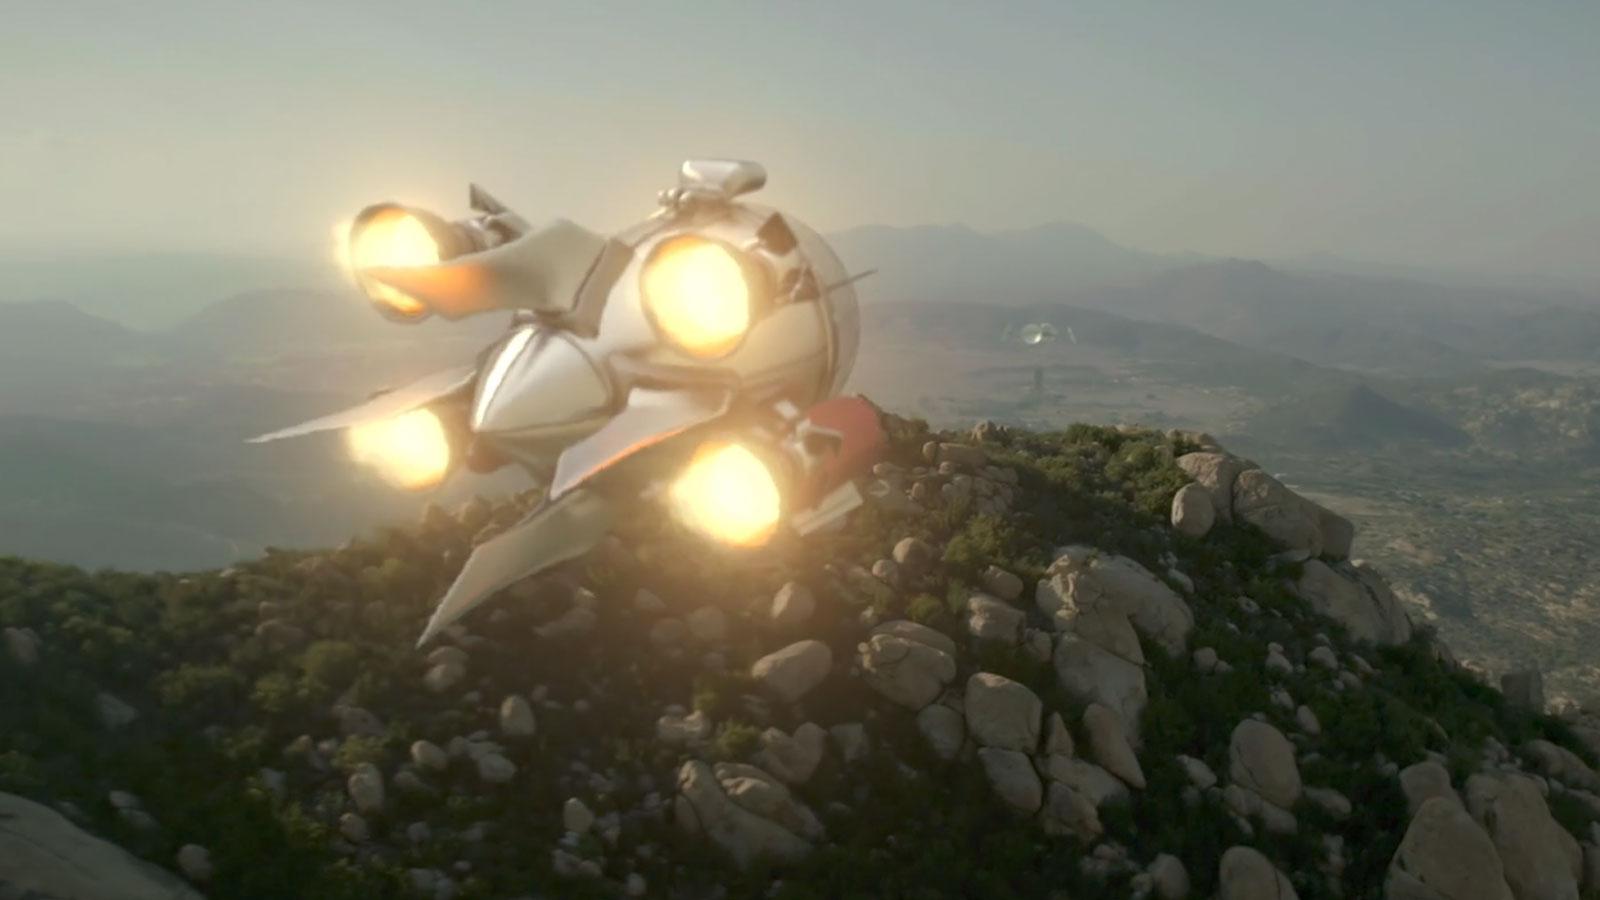 CG Spectrum   The Online School for Animation, VFX & Game Design